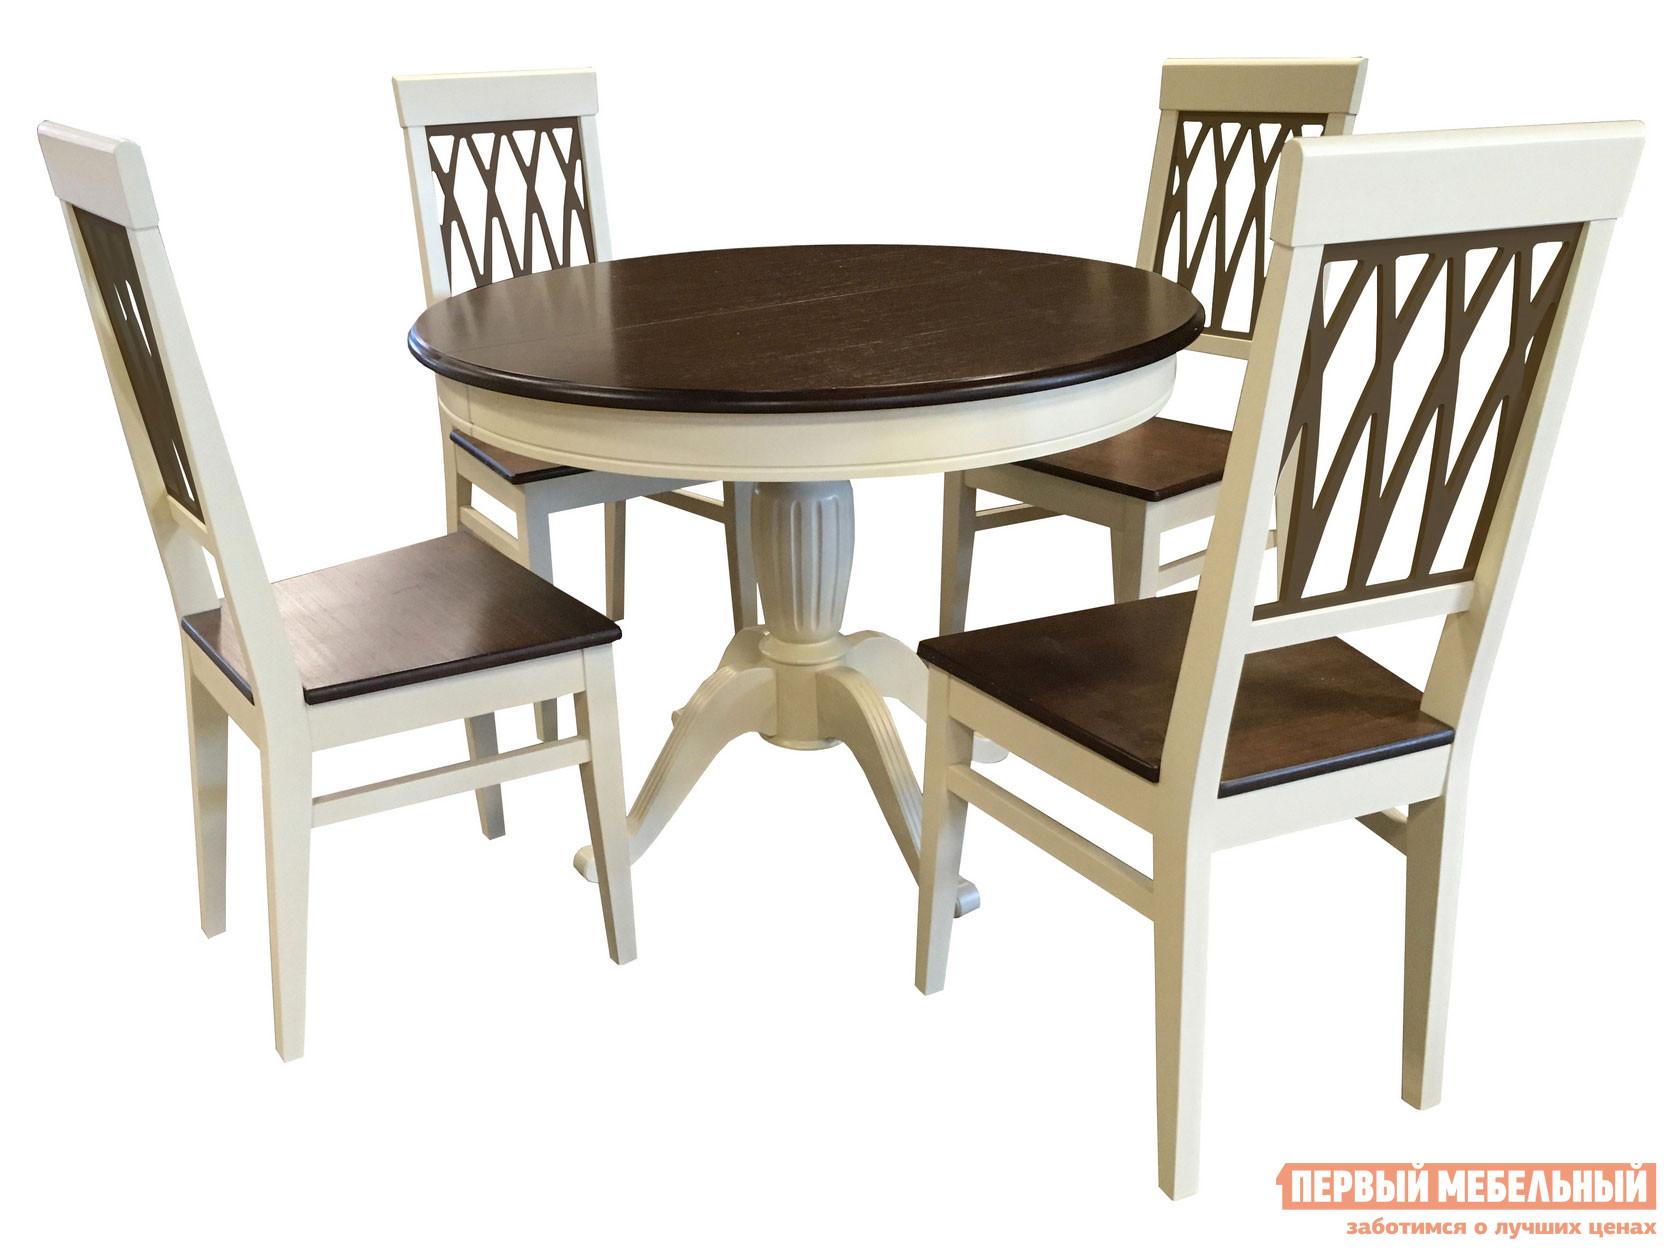 Столовая группа из массива дерева Mebwill Леонардо стол + 4 стула Кристиан